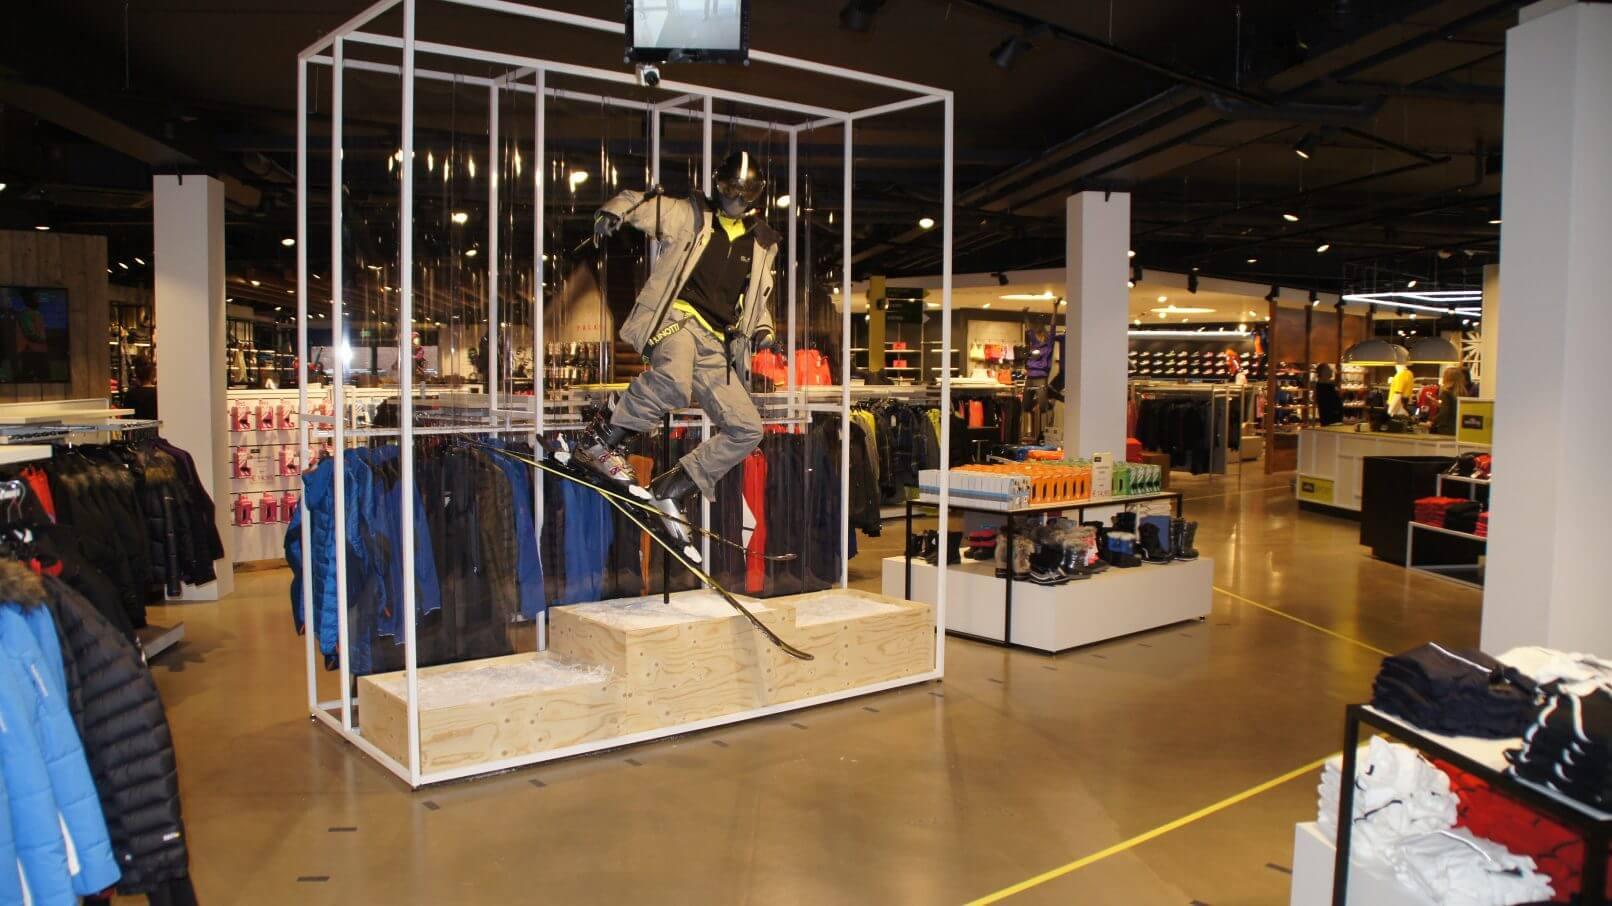 Van Tilburg Mode Tassen : Verbouwing van tilburg mode en sport te nistelrode